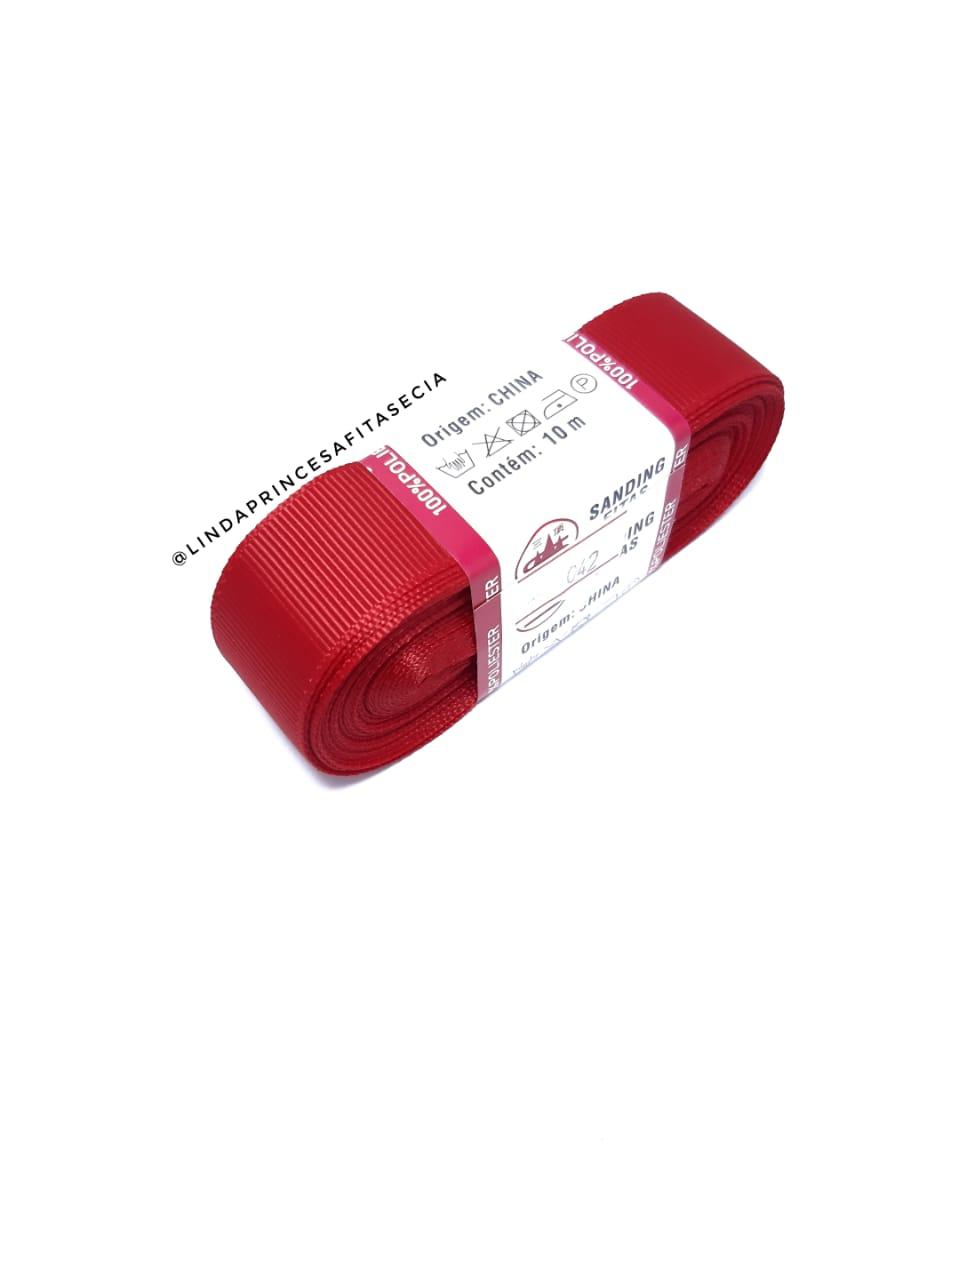 FITA SANDING 22 mm - Cor: 042 Vermelho Rubi.